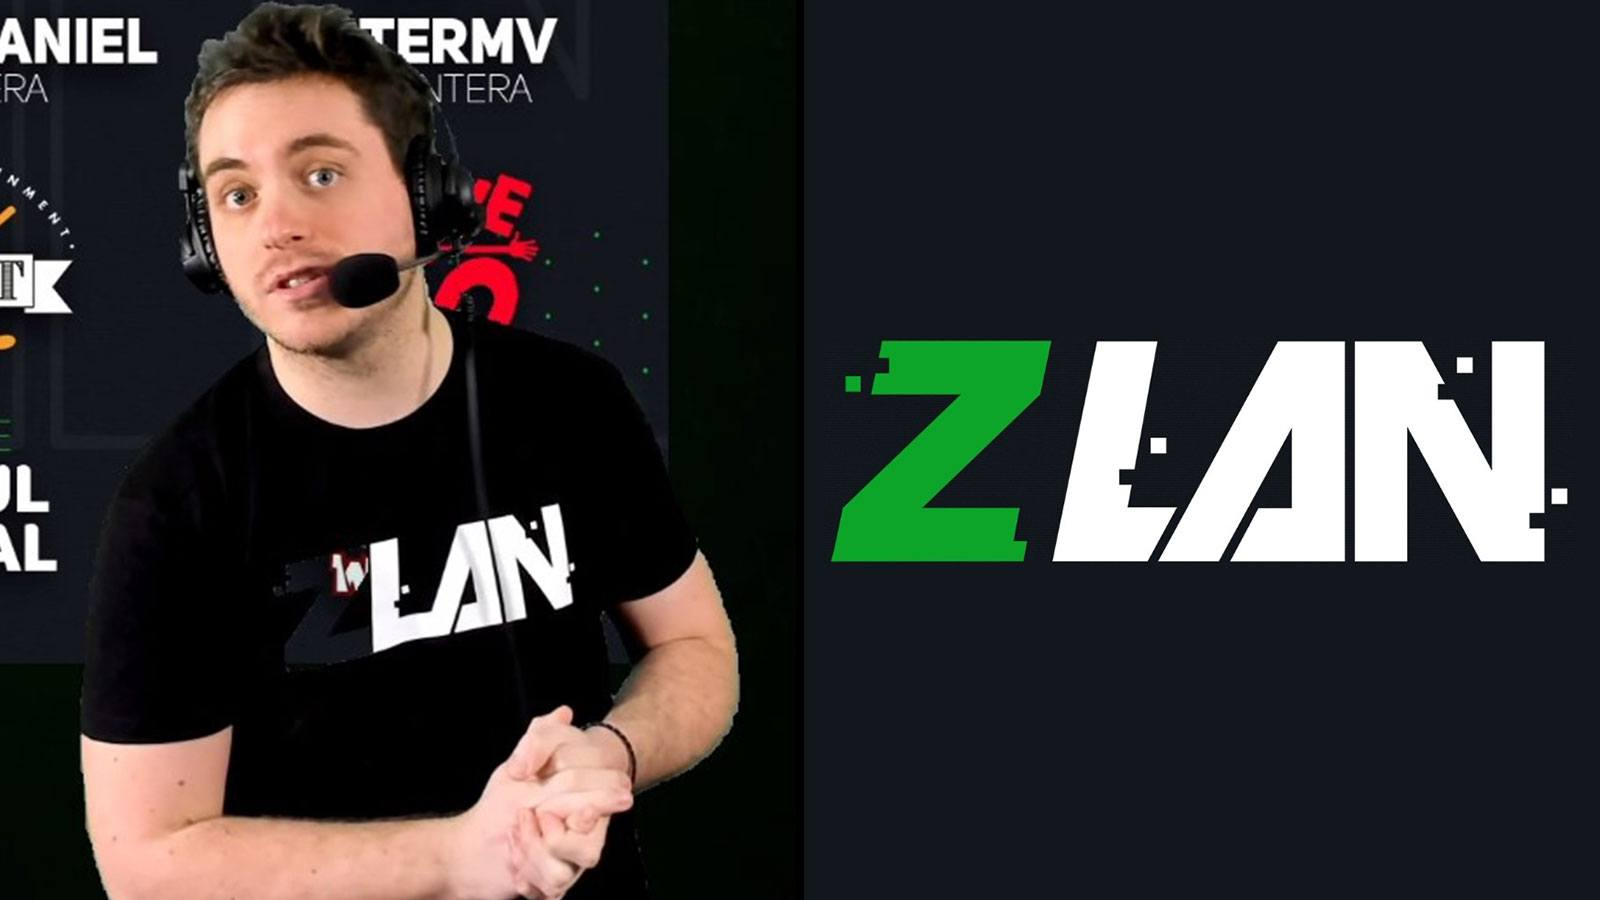 ZeratoR en stream sur Twitch pour la ZLAN